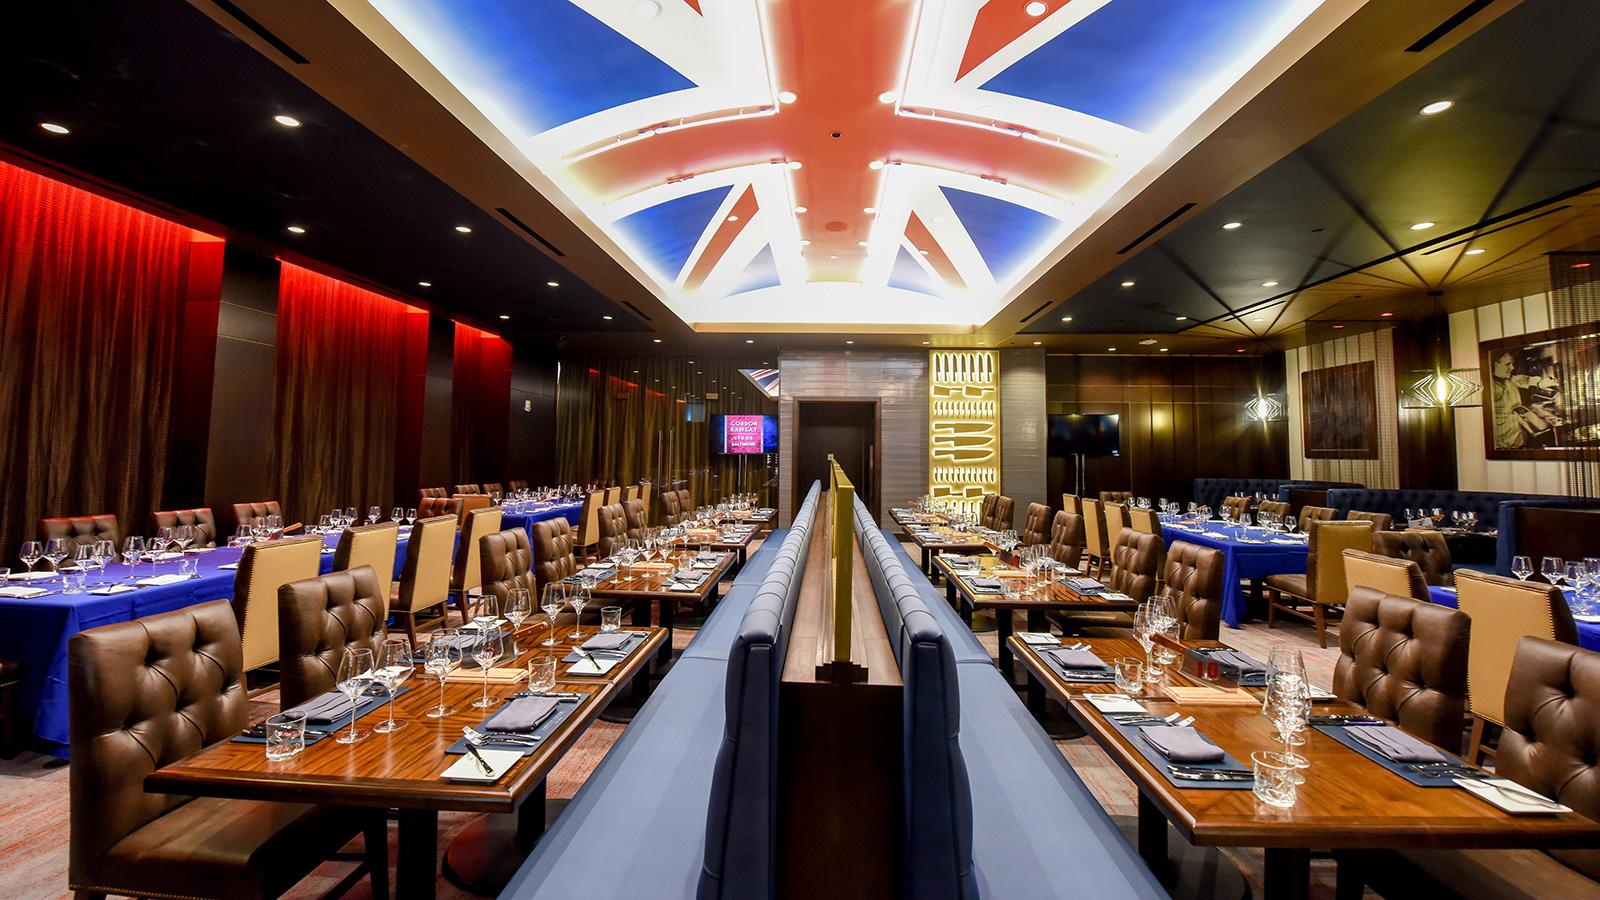 Turning tables gordon ramsay opens new steak house in - Gordon ramsay cuisine cool ...